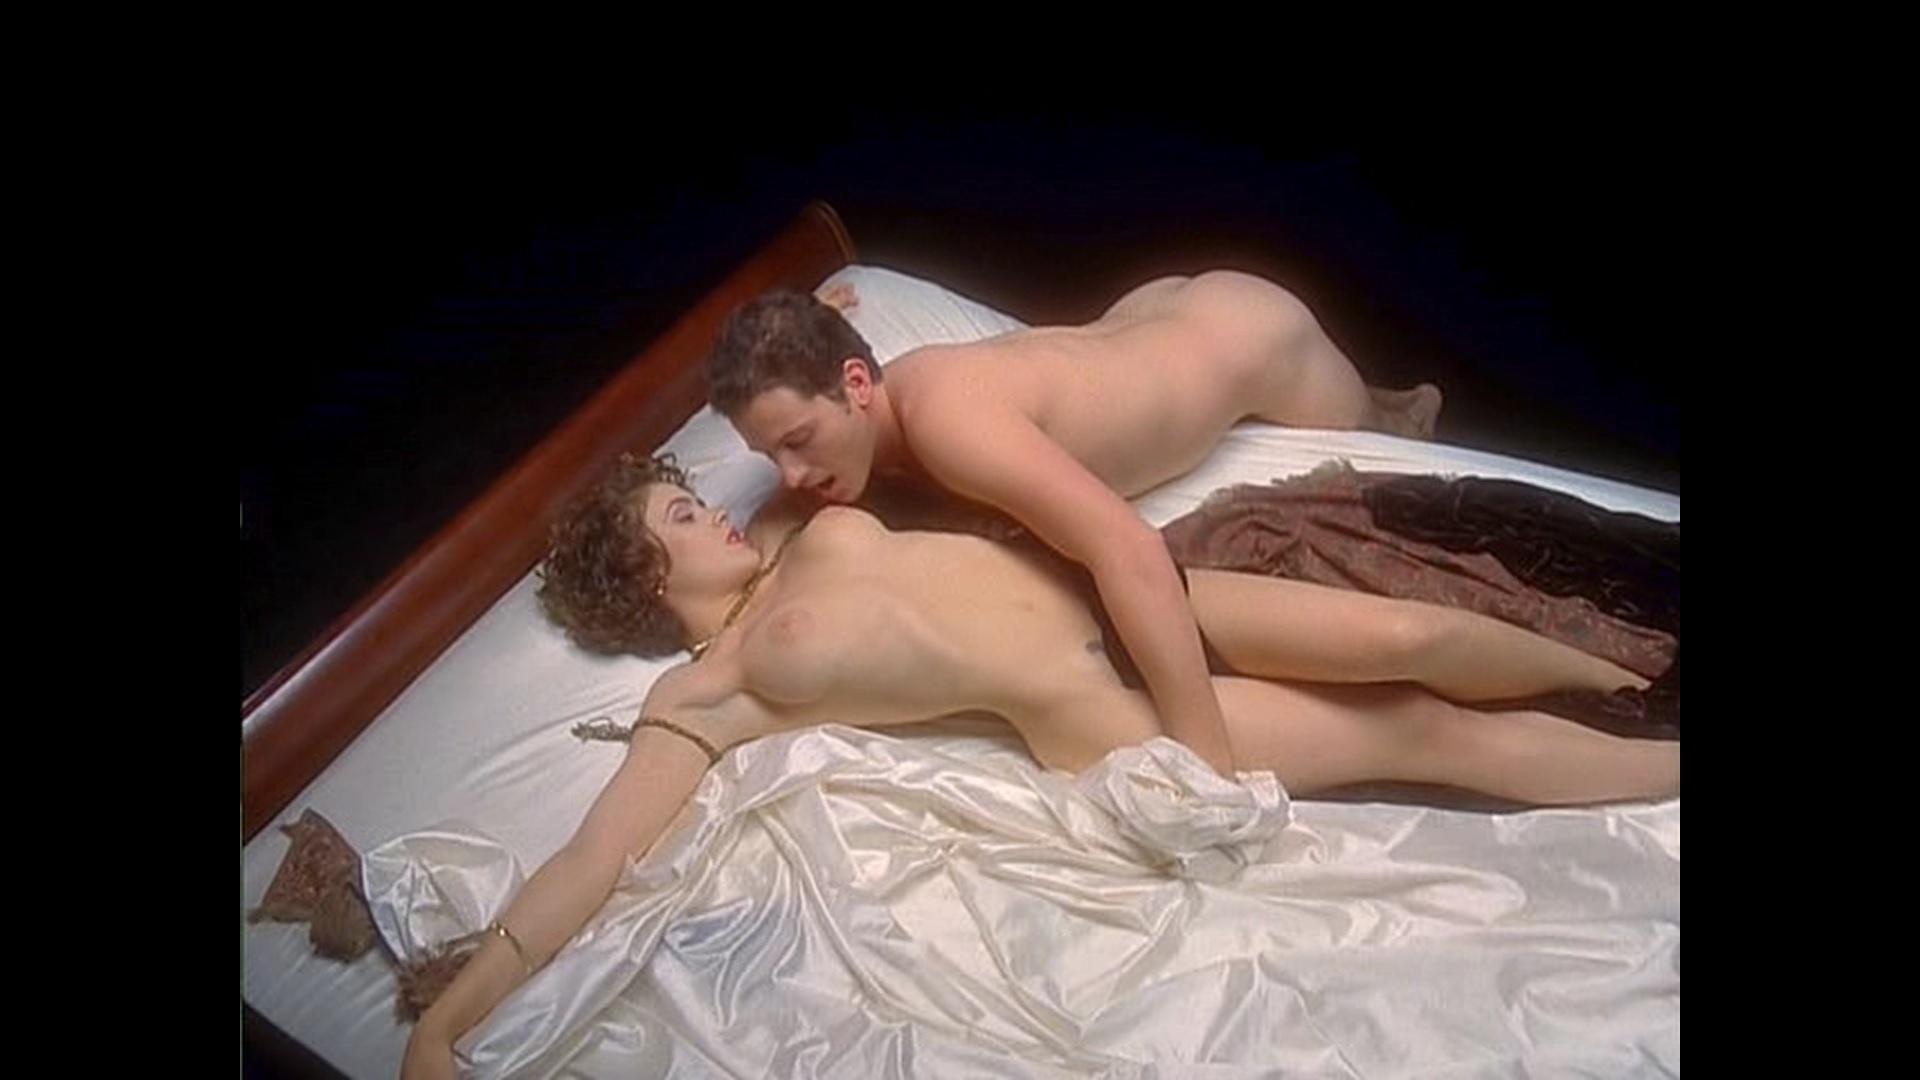 All In Alyssa Dvd Porn alyssa milano sexy ass nacked - sex photo